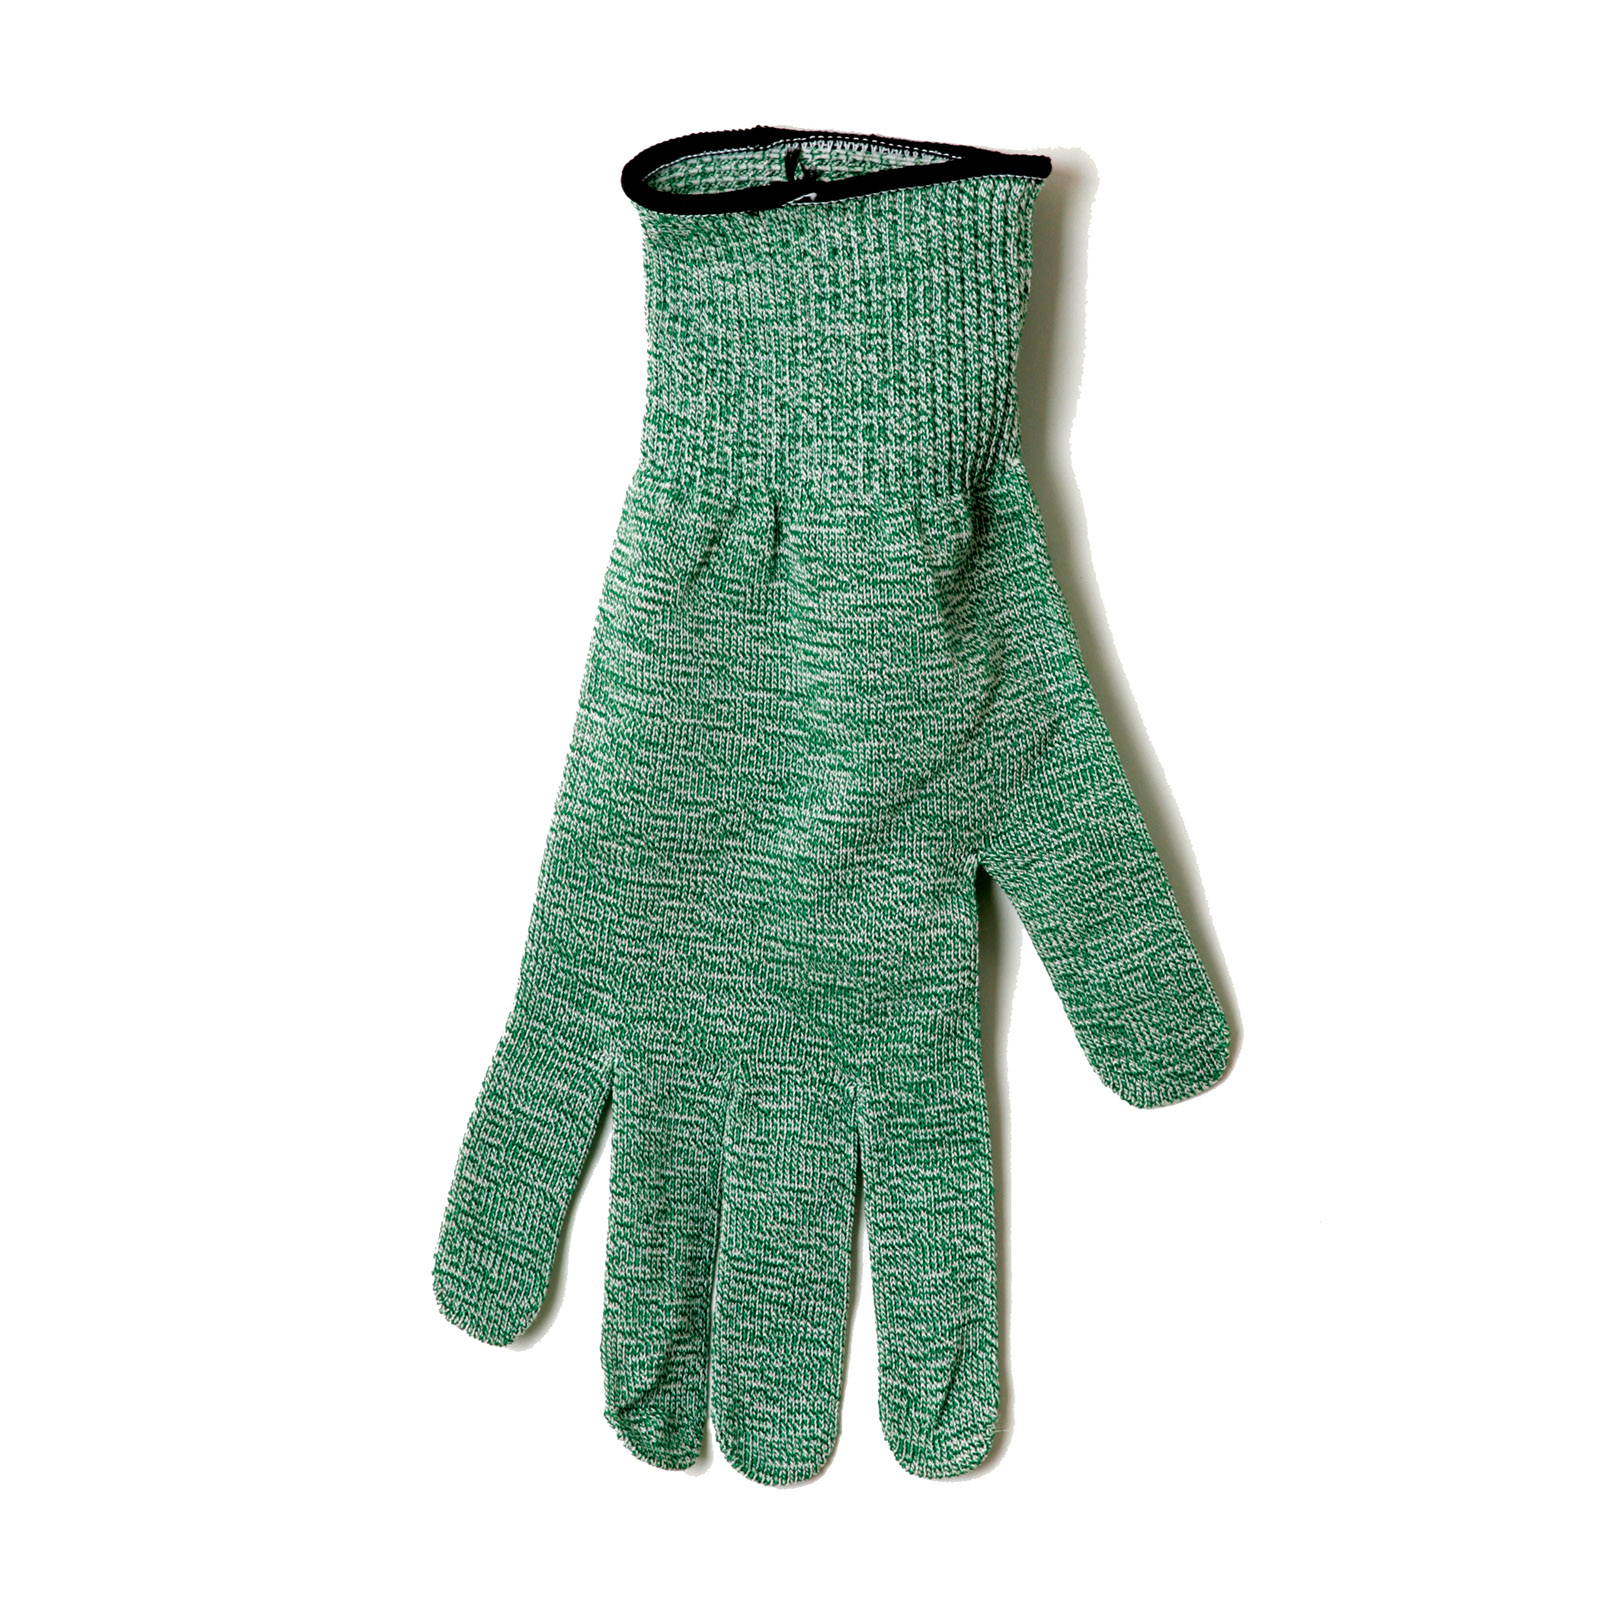 San Jamar SG10-GN-L glove, cut resistant